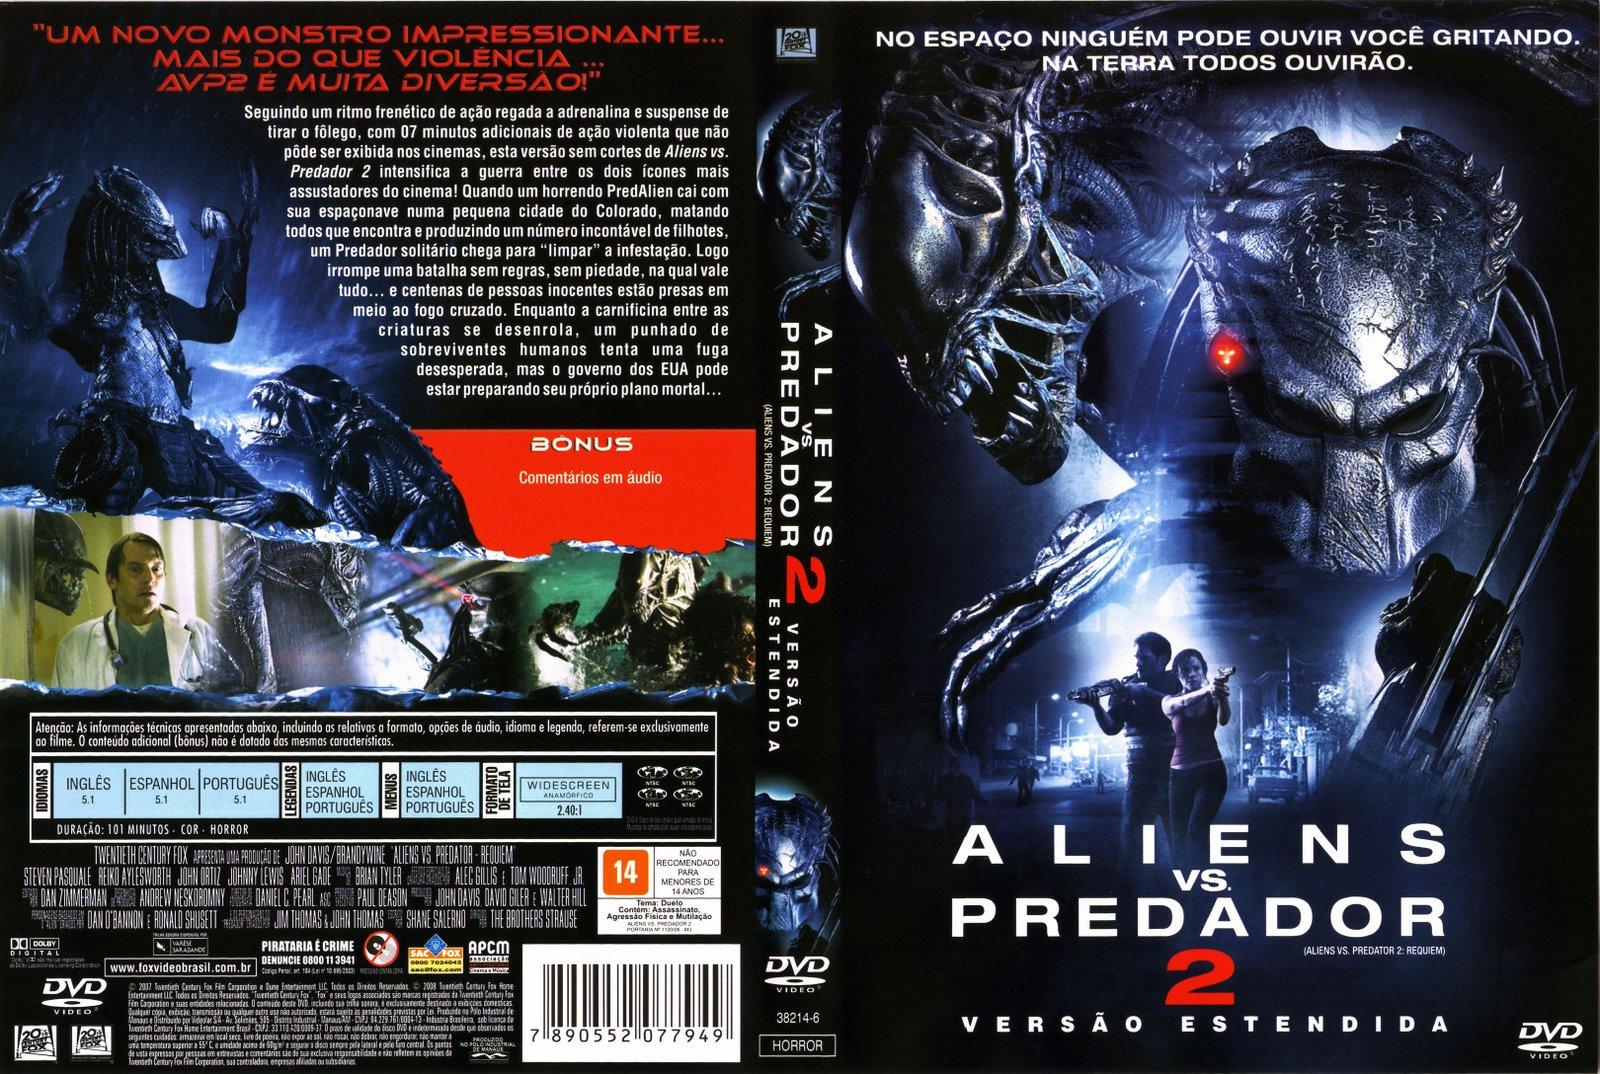 http://1.bp.blogspot.com/_pnOdTUC4iSY/TDIktgw6_zI/AAAAAAAAACs/K5uLar4TdVw/s1600/Aliens_Vs_Predador_2.jpg